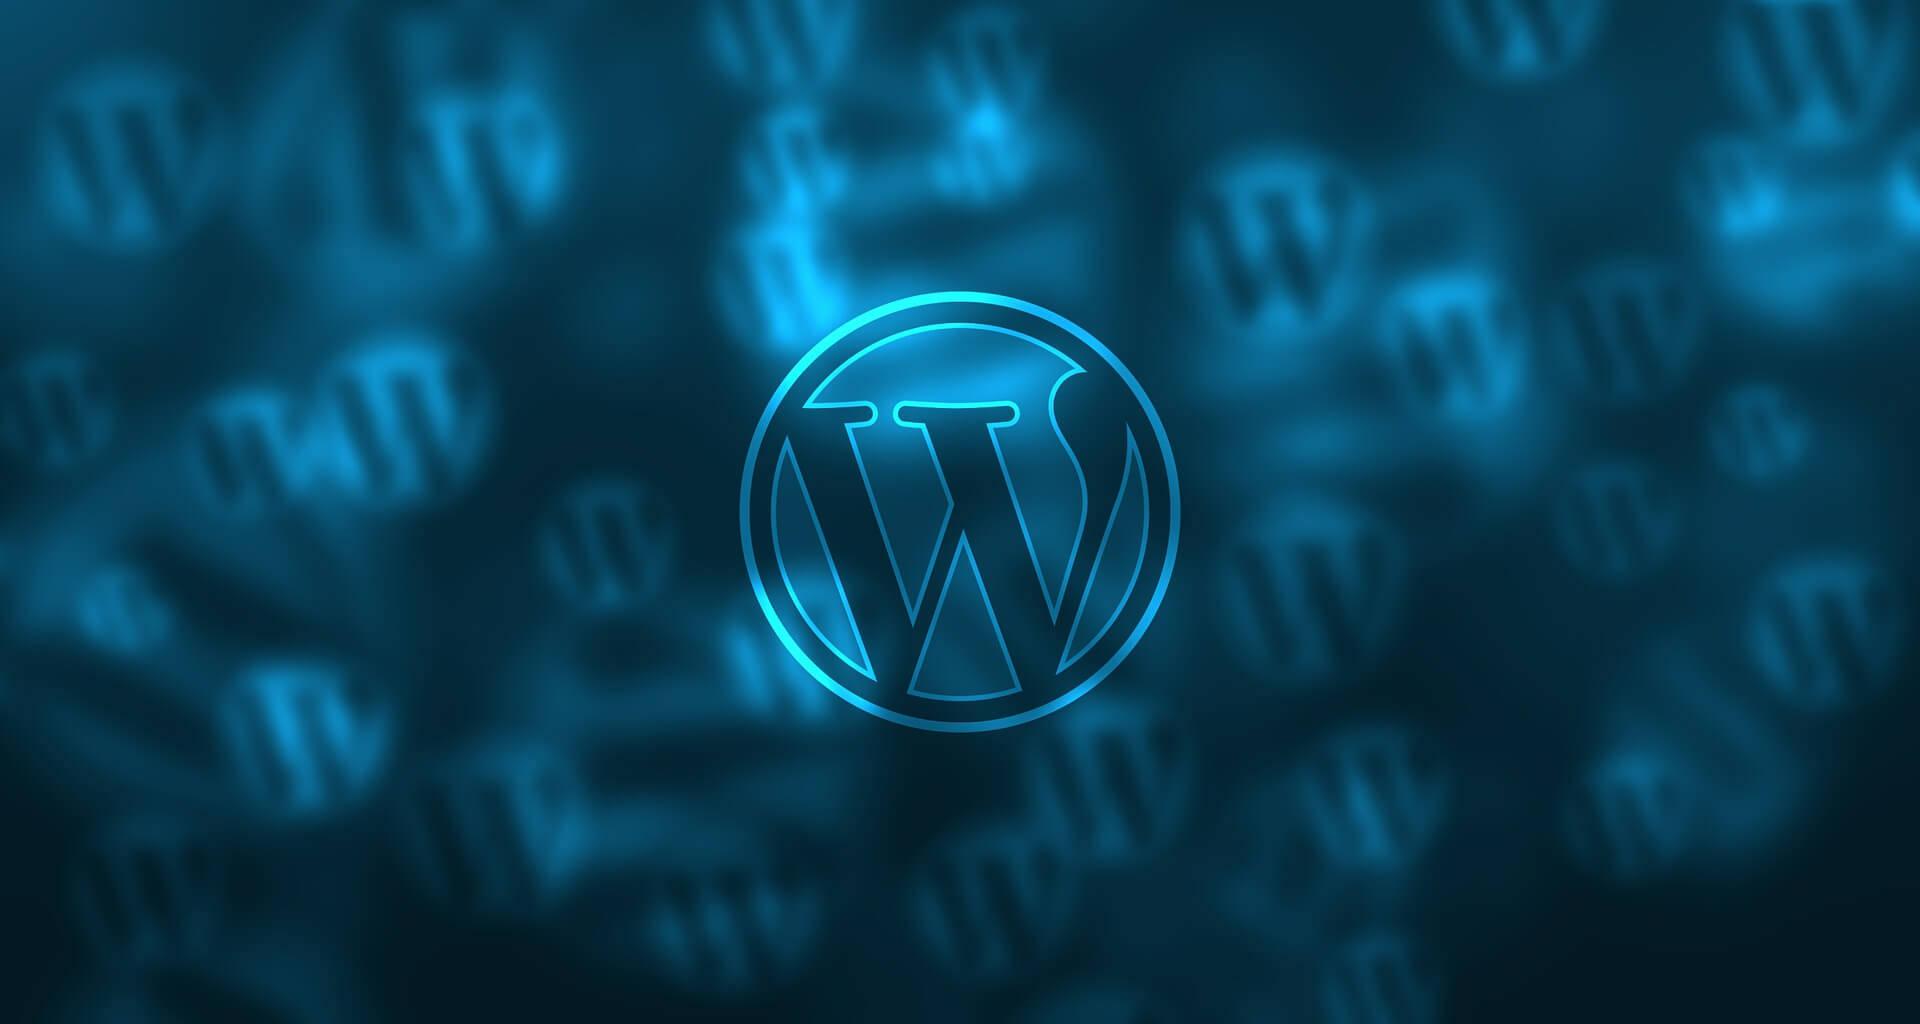 WordPress Lelet? Berikut Tips Lengkap Mempercepat WordPress